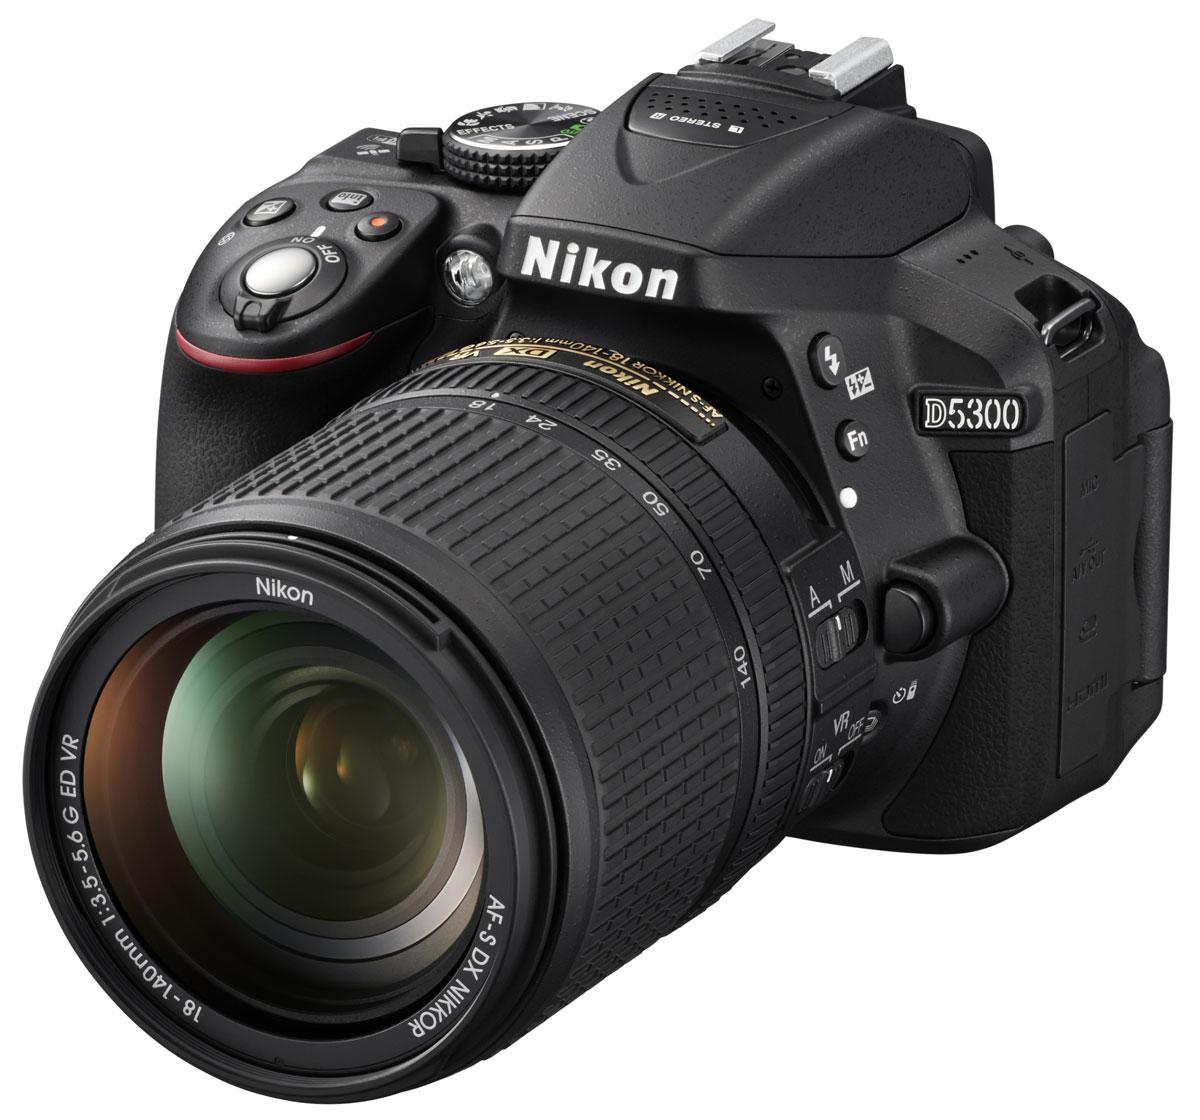 Зеркальный фотоаппарат Nikon D5300 Kit 18-140 VR, Black зеркальный фотоаппарат nikon d7500 af s dx nikkor 18 105vr черный